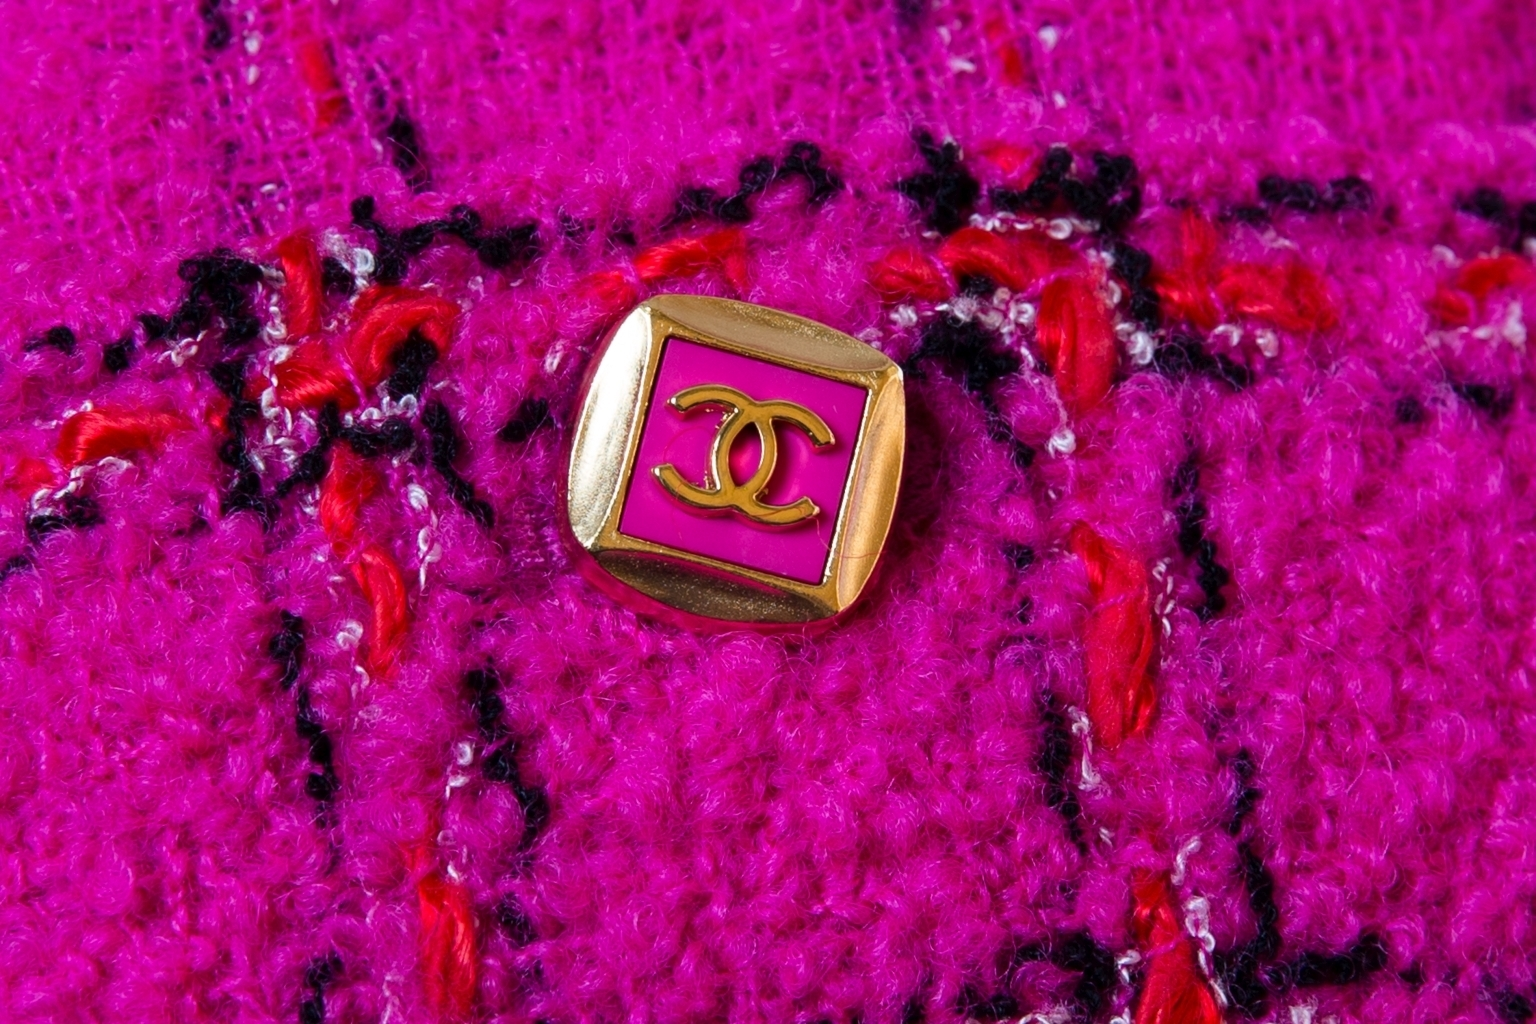 Стильный жакет из твида цвета фуксии от Chanel, 38 размер.